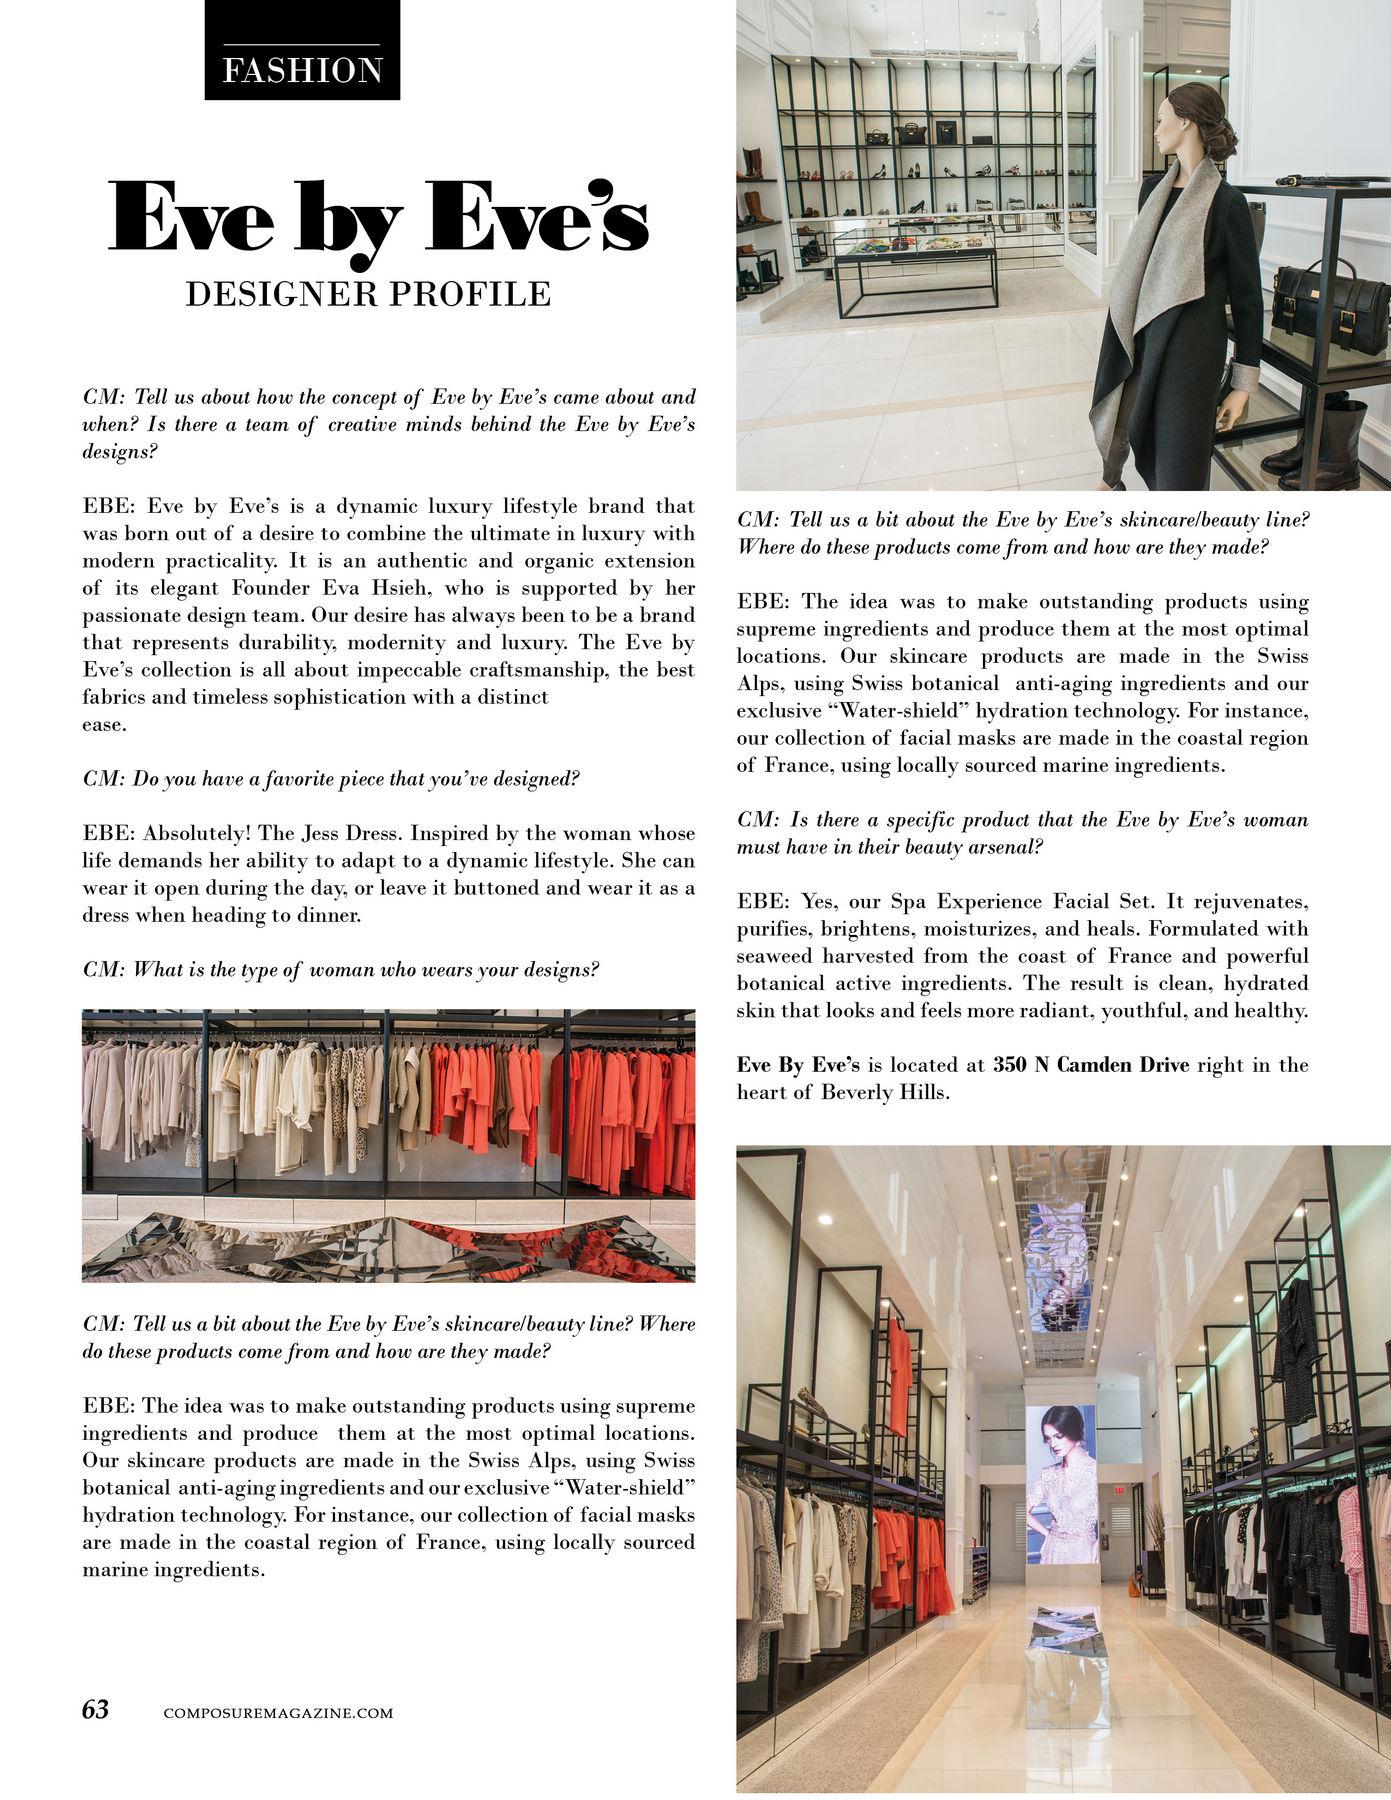 Fashion Designer Profile: Eve by Eve's